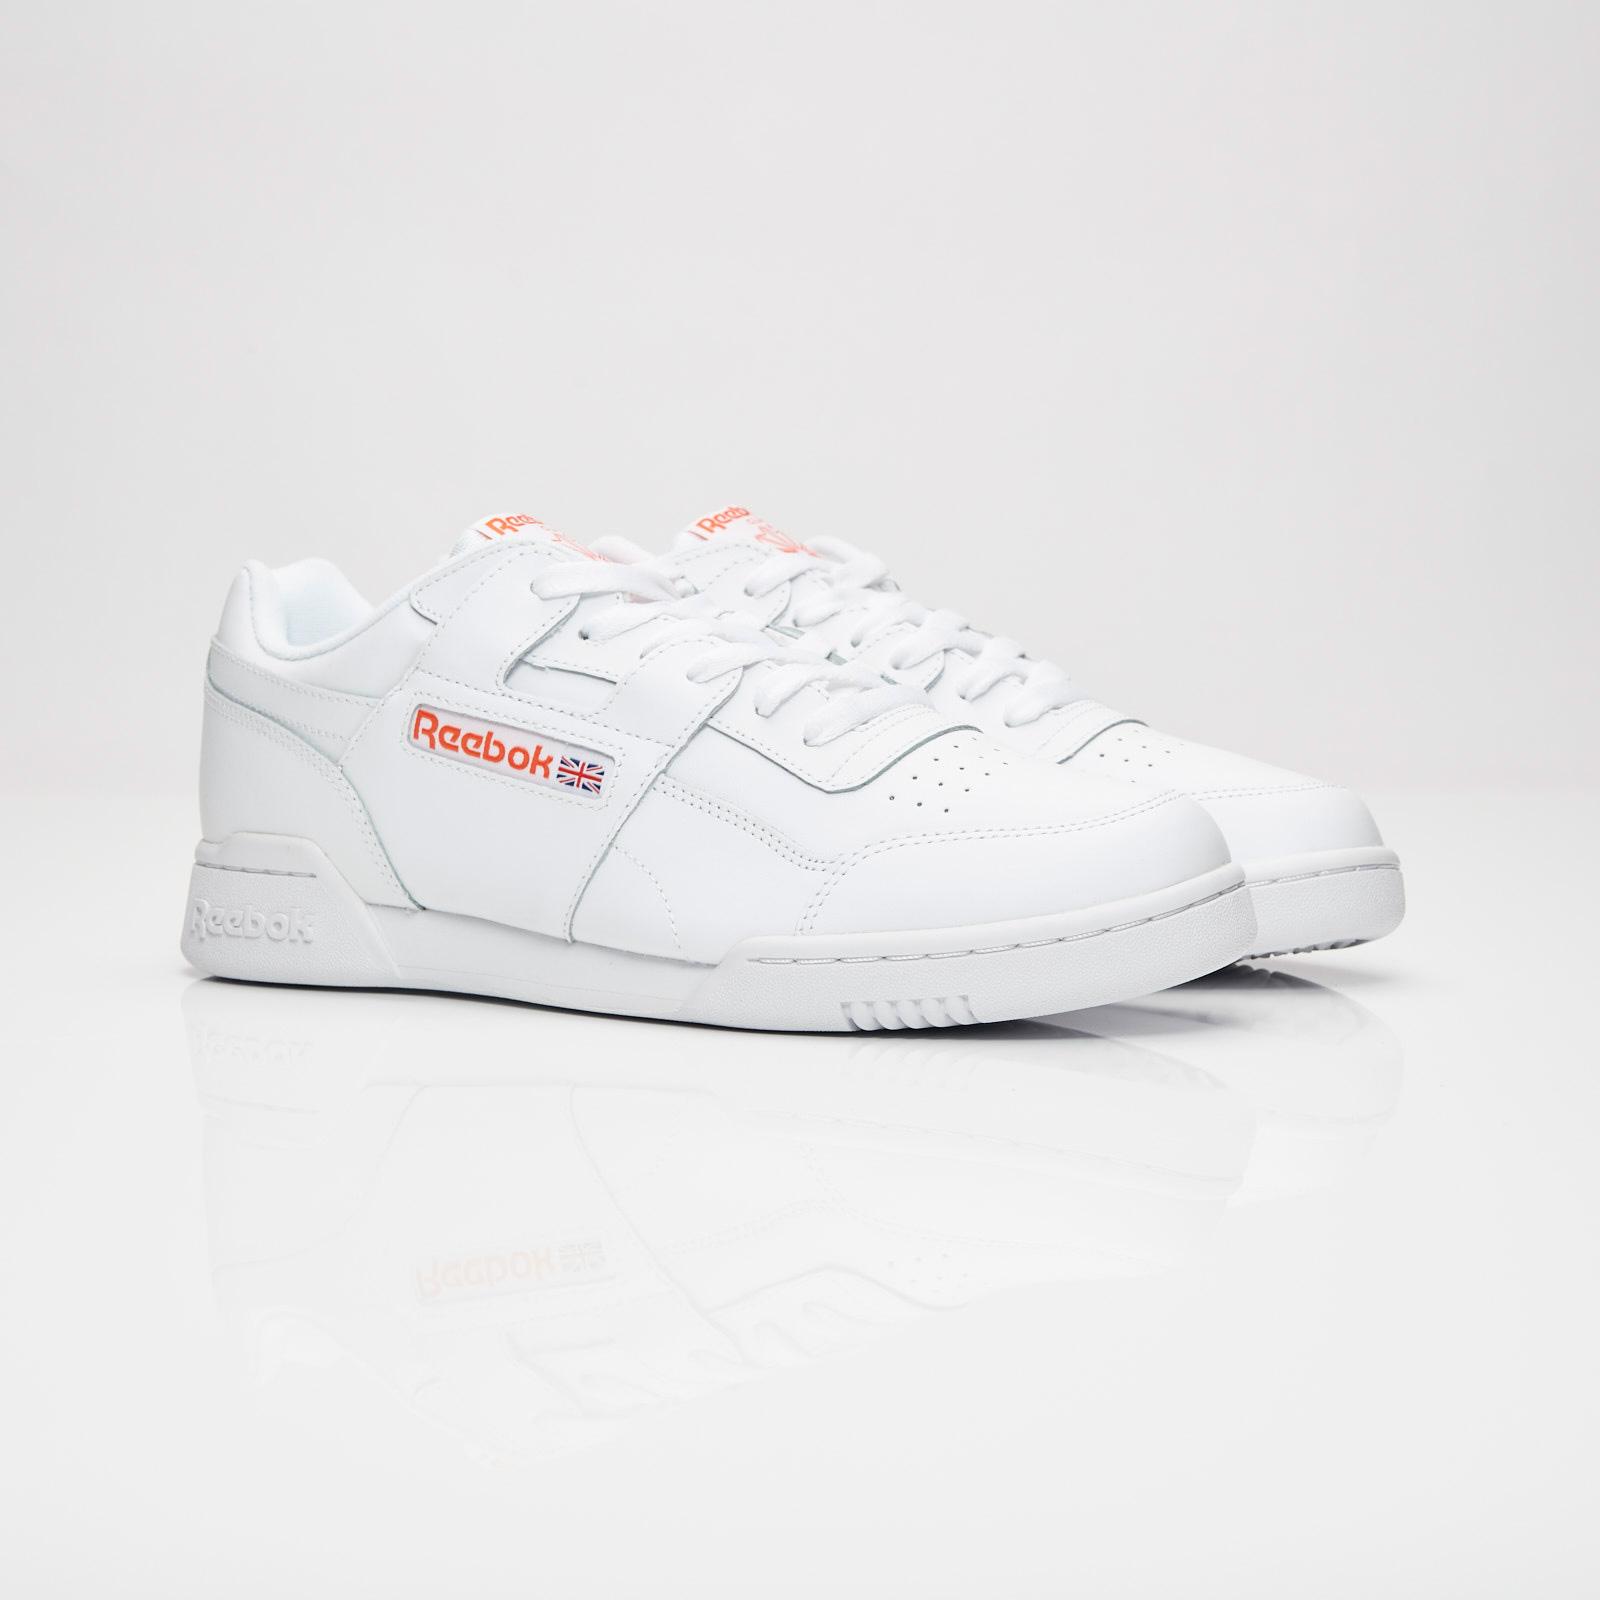 fdddb57cee4 Reebok Workout Plus Mu - Cn5203 - Sneakersnstuff